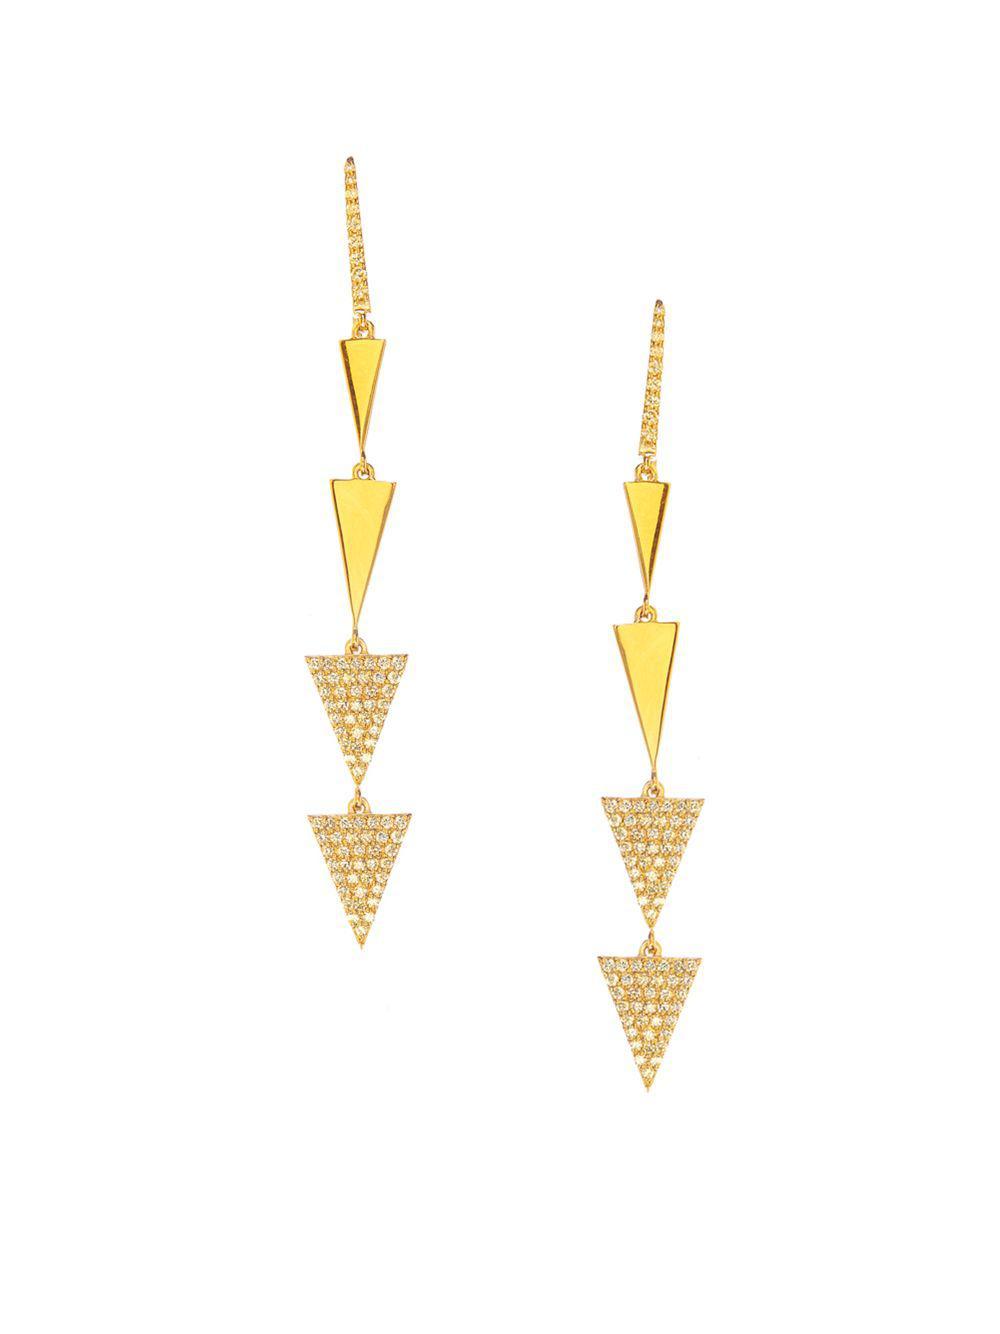 Lana Jewelry 14k Rose Gold Flawless Diamond Spike Earrings bP4jhU